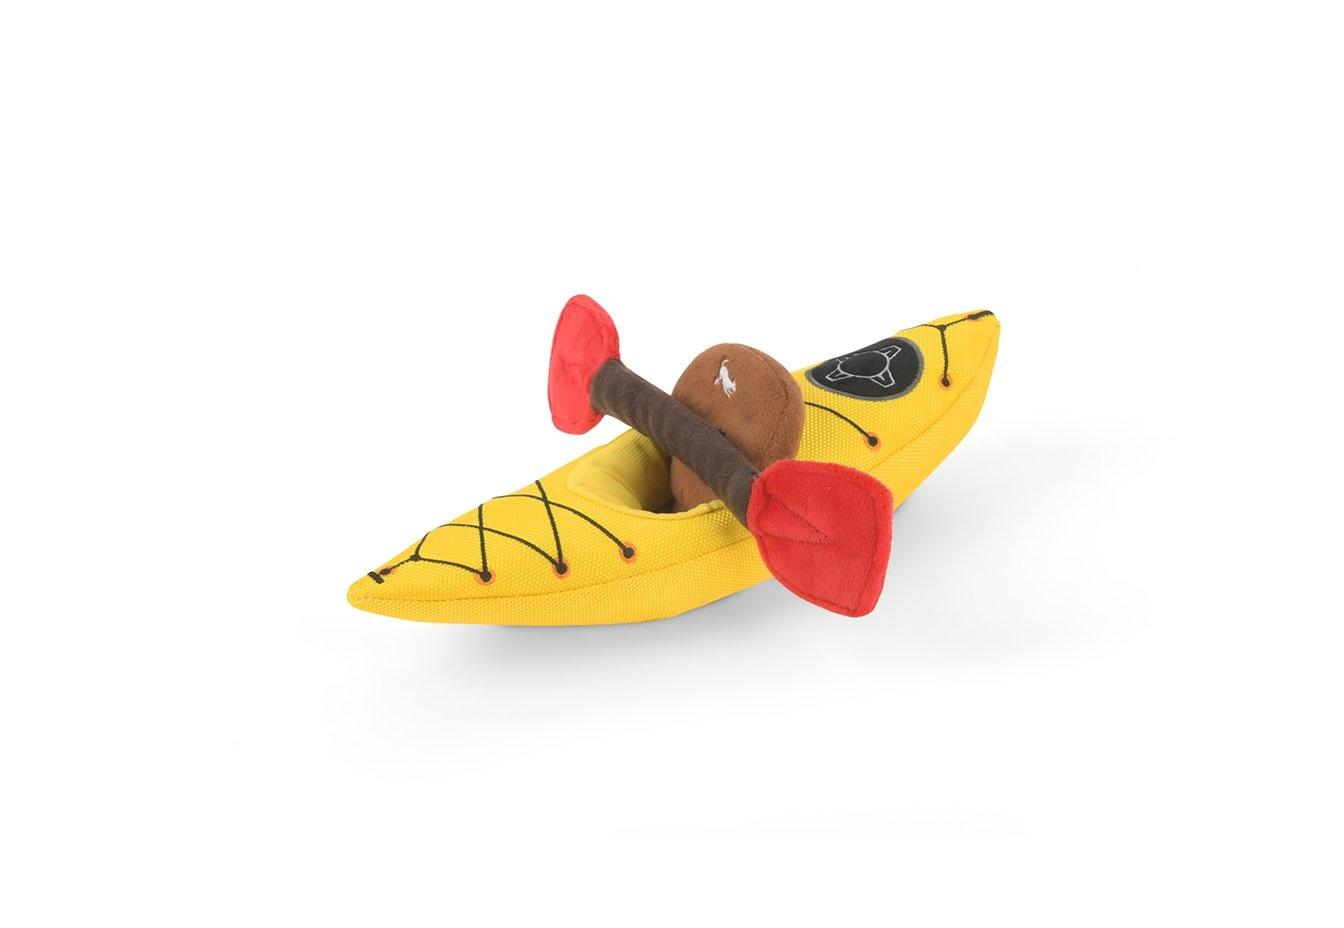 PLAY Camp Corbin K9 Kayak Toy